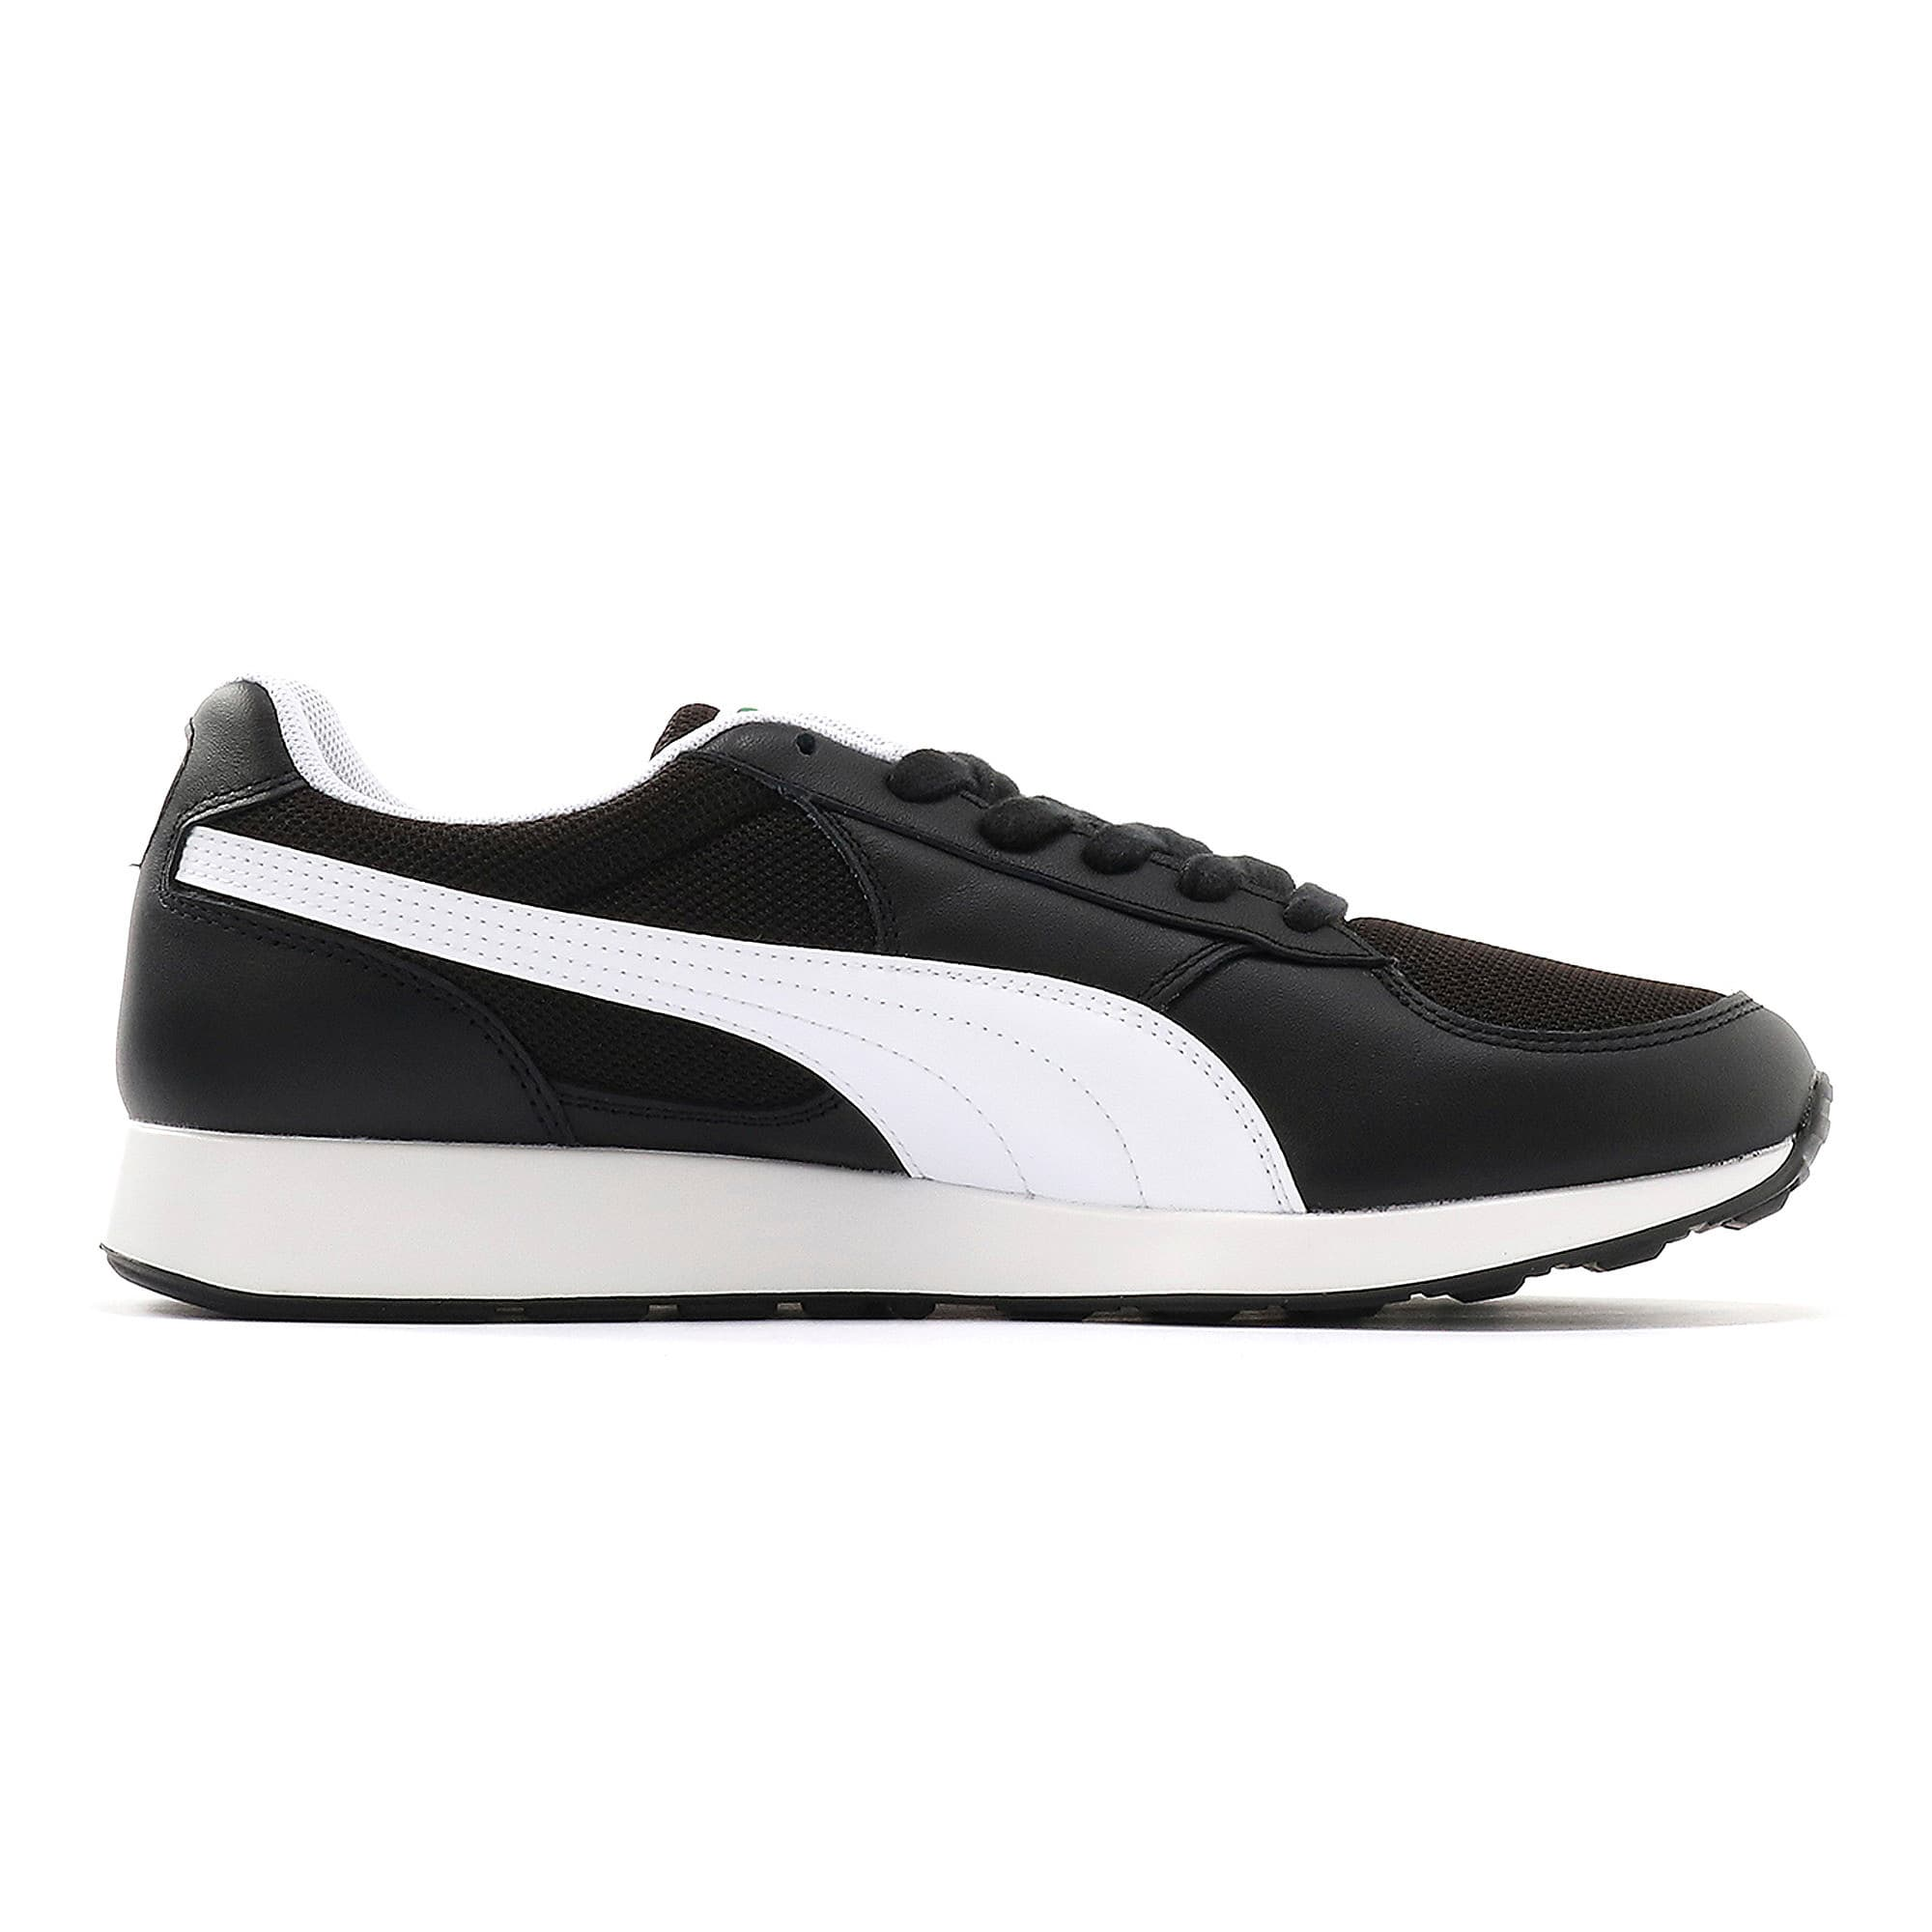 Thumbnail 5 of RS-1 OG CLONE Sneakers, Puma Black-CASTLEROCK, medium